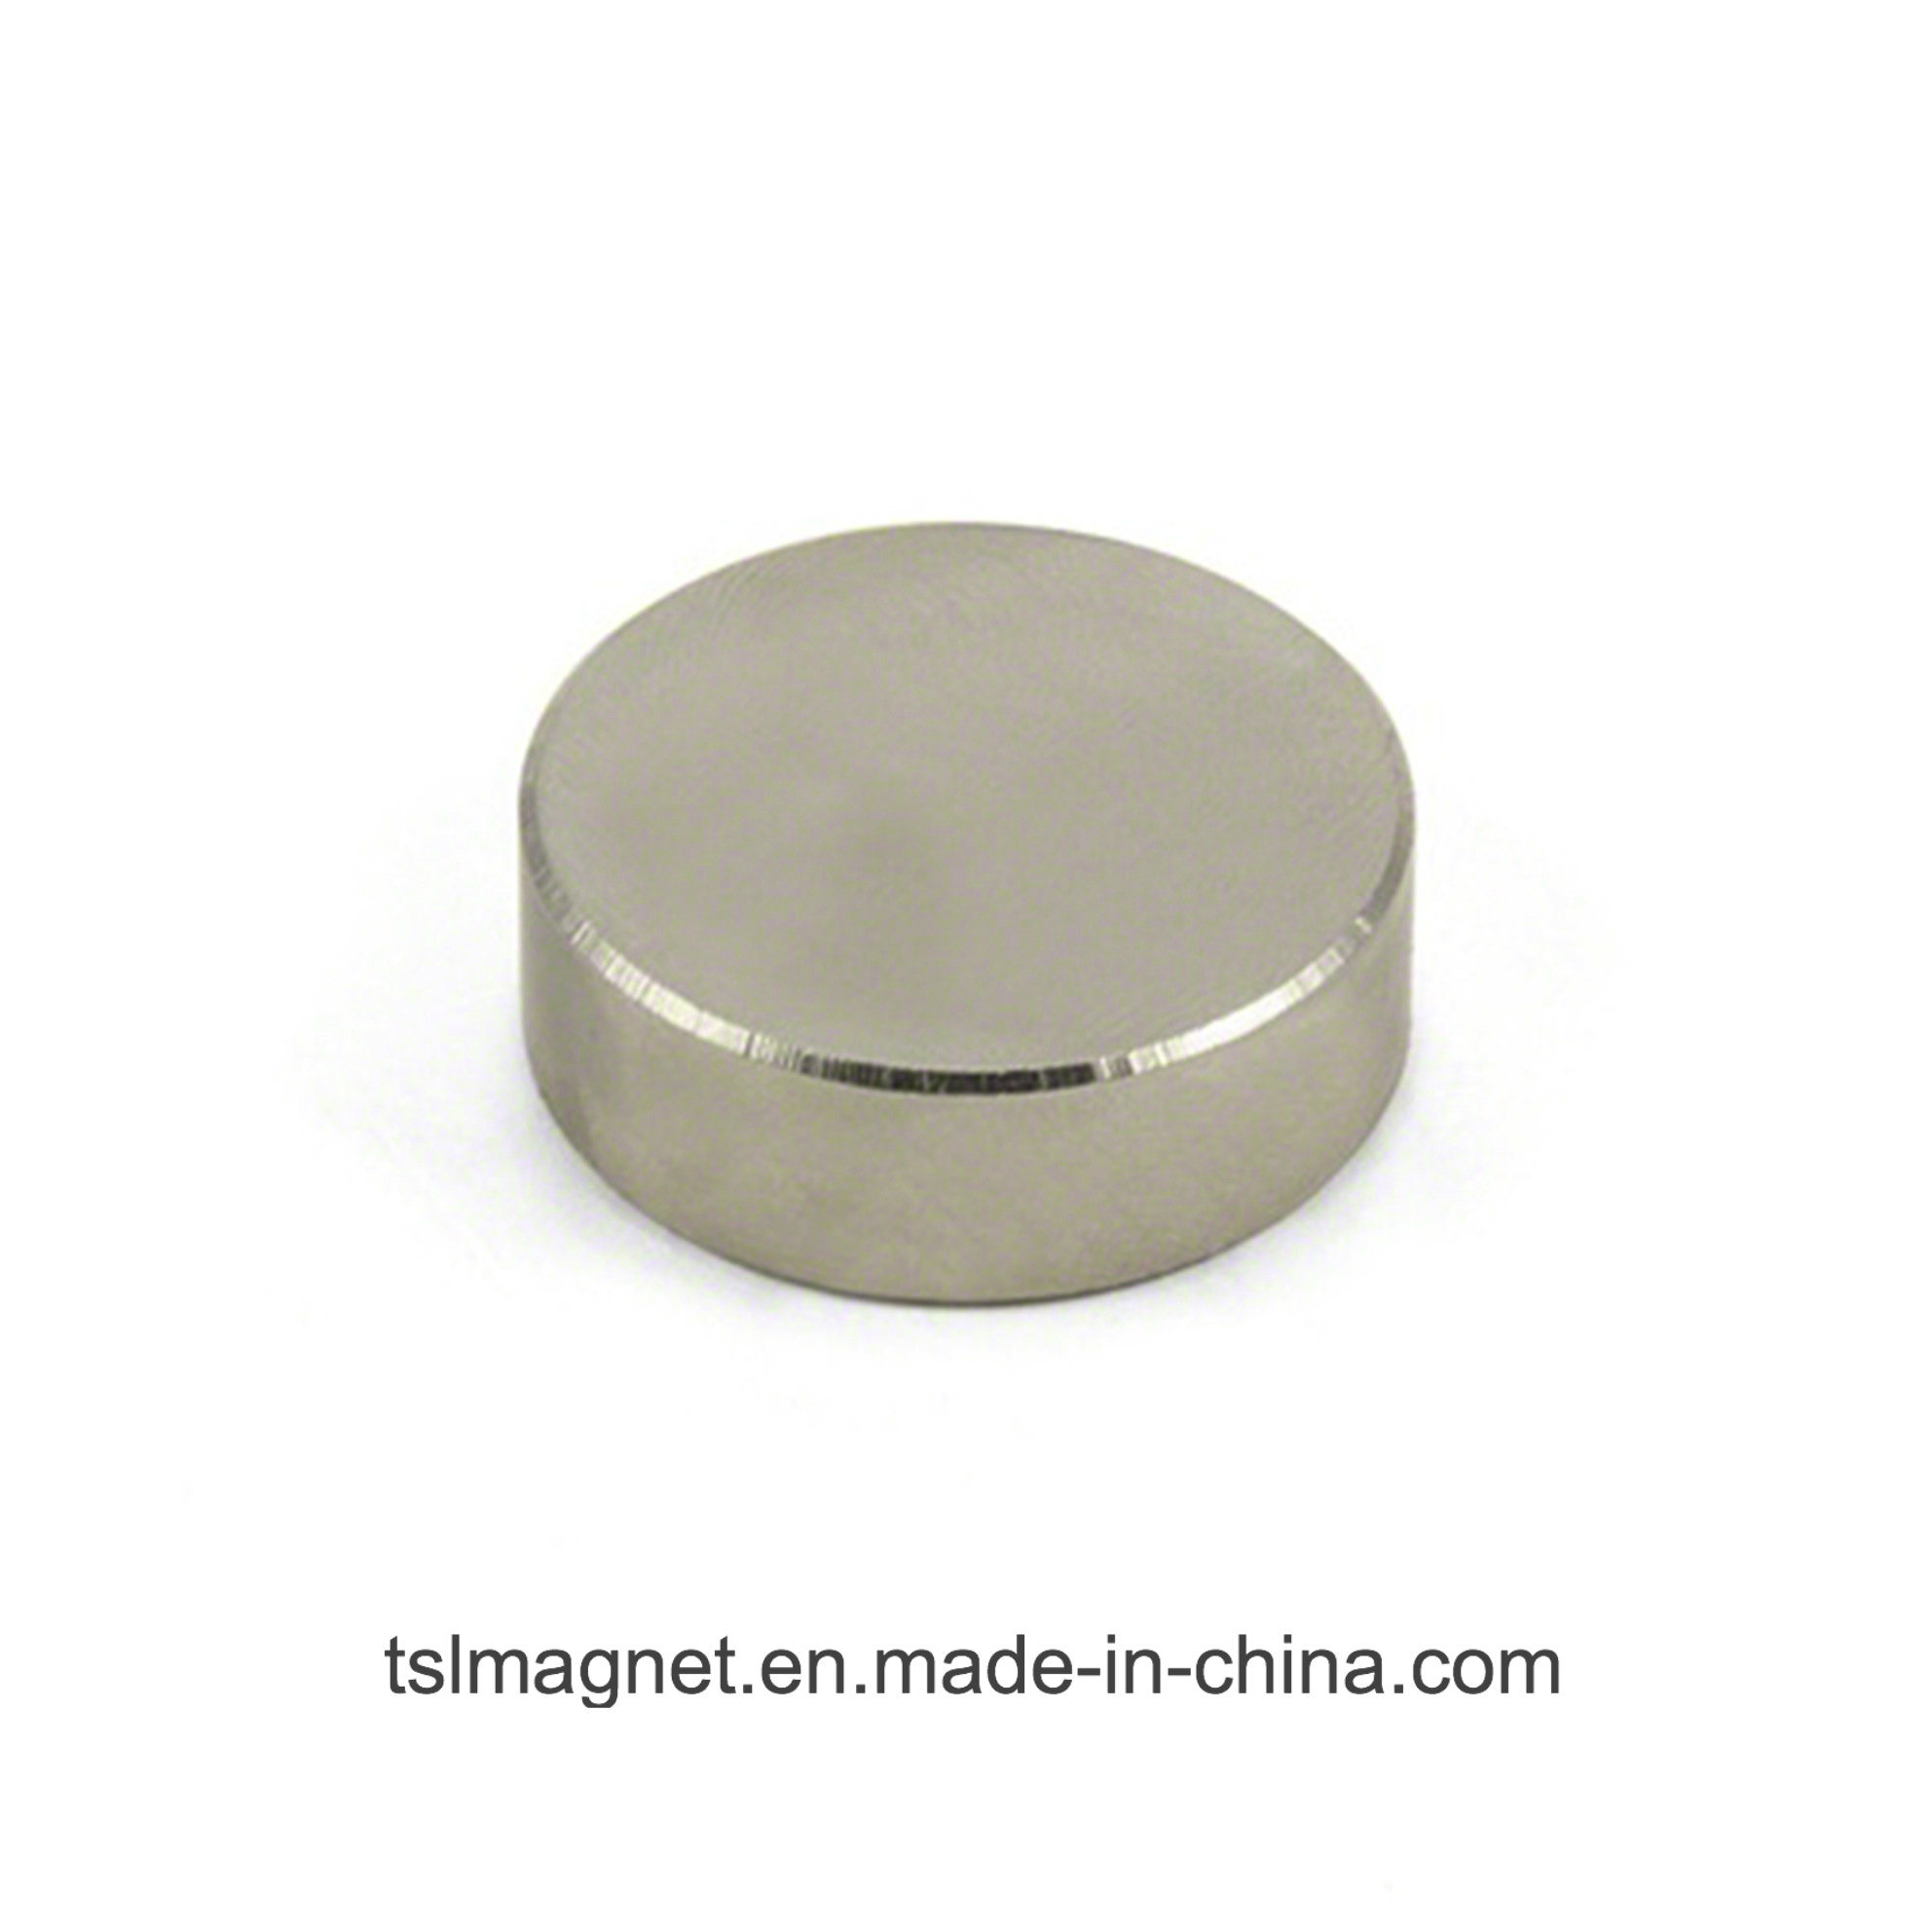 Powerful Permanent Sintered Neodymium Magnet for Bracelet (N42)